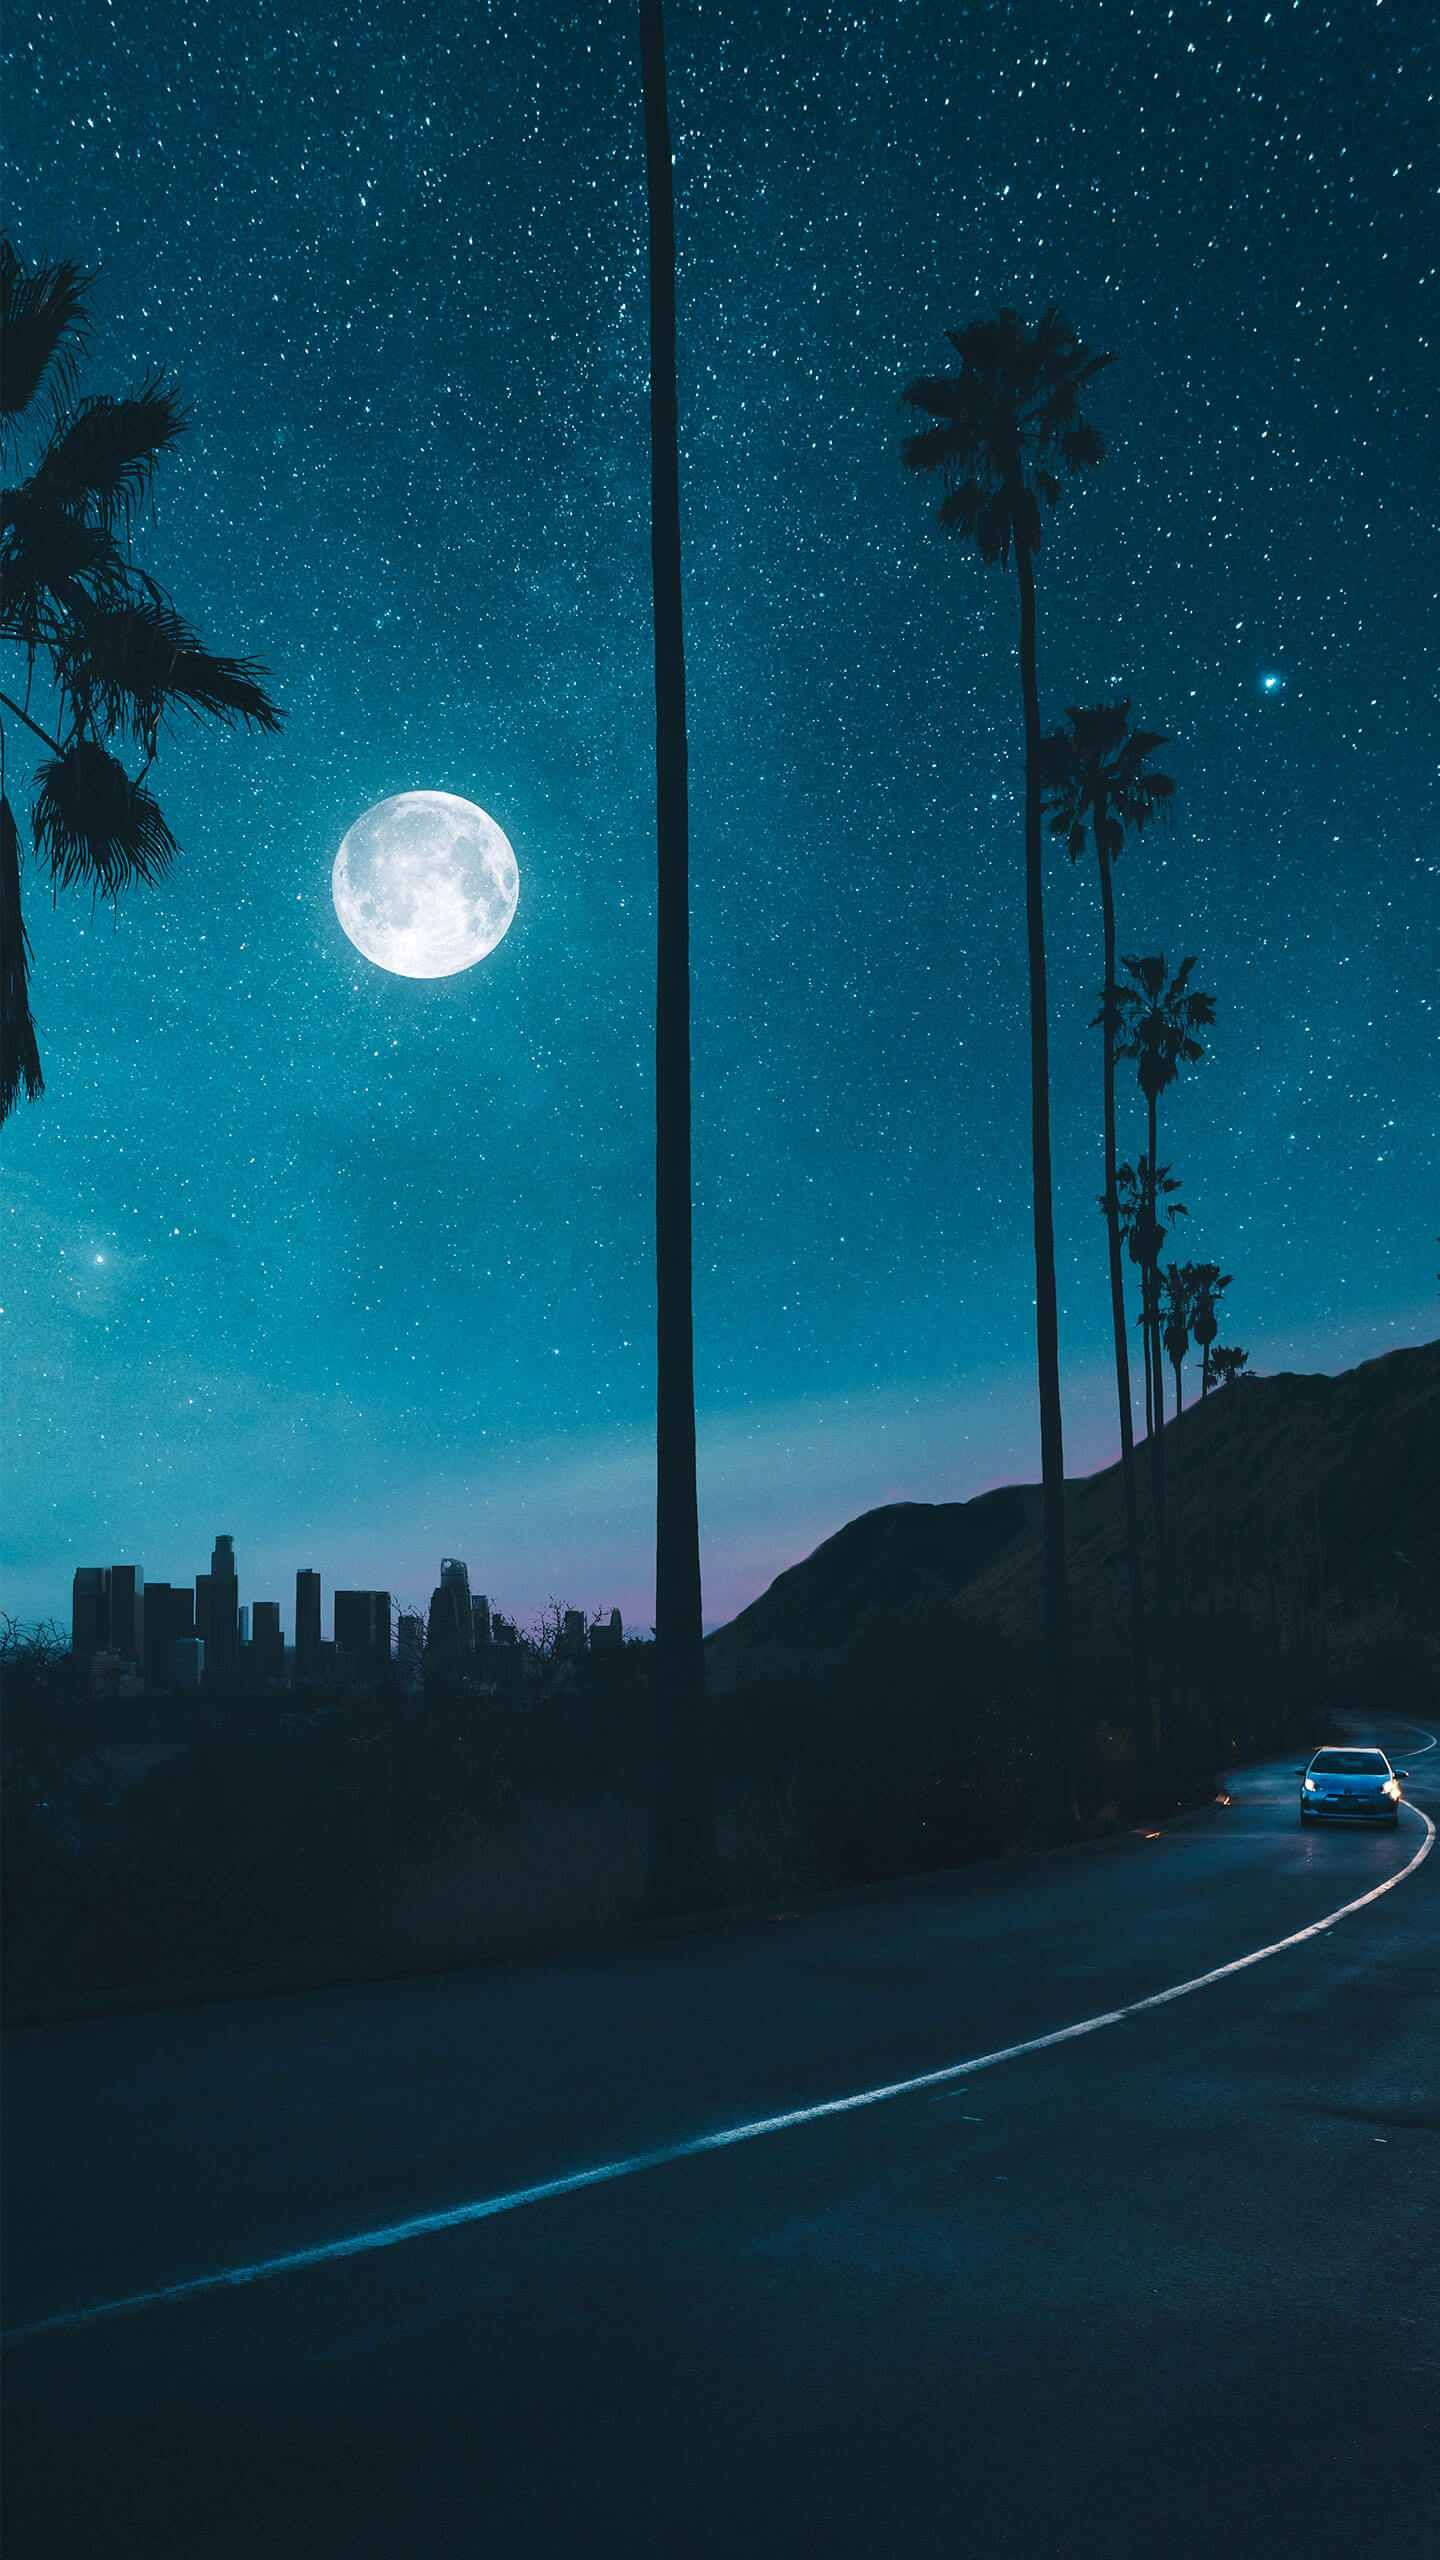 City S Night Sky Full Of Stars Night Skies Wallpaper Diy Crafts